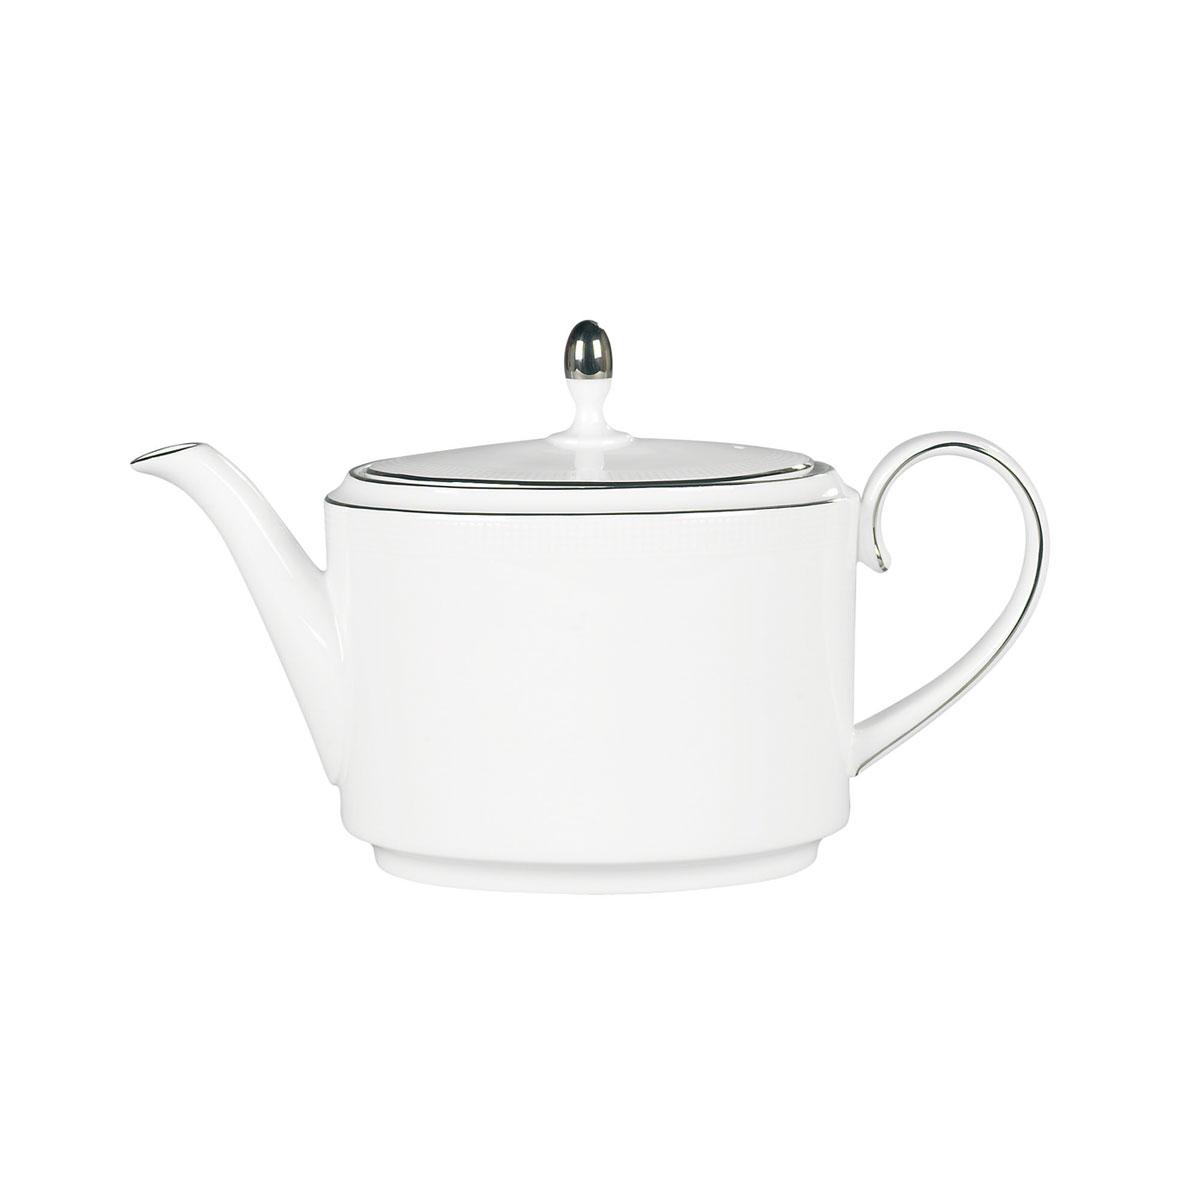 Vera Wang Wedgwood Blanc Sur Blanc Teapot 1.4 Ltr, 47.3oz.